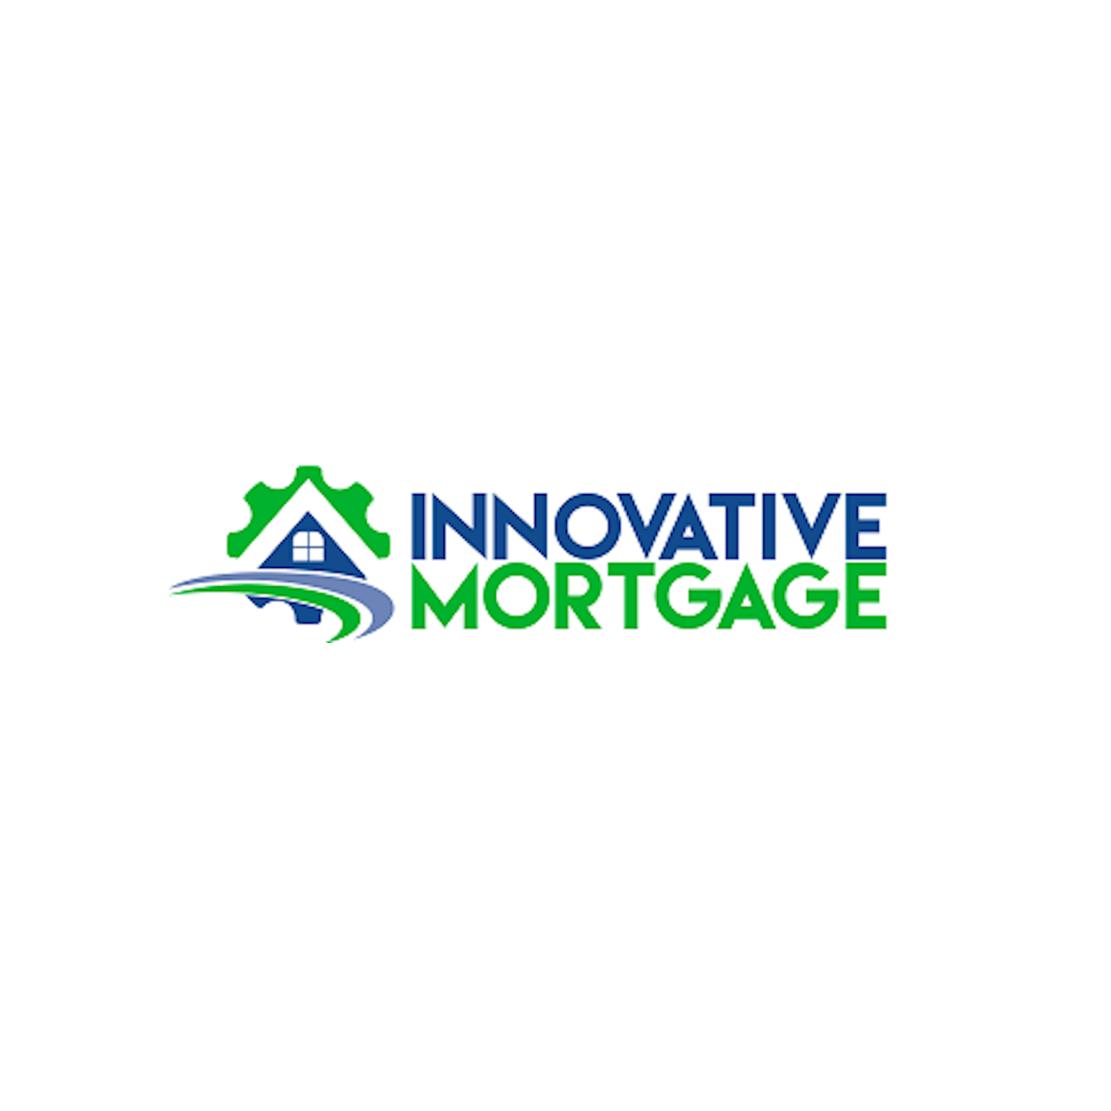 Steven Mayer - Innovative Mortgage Services NMLS# 1037238